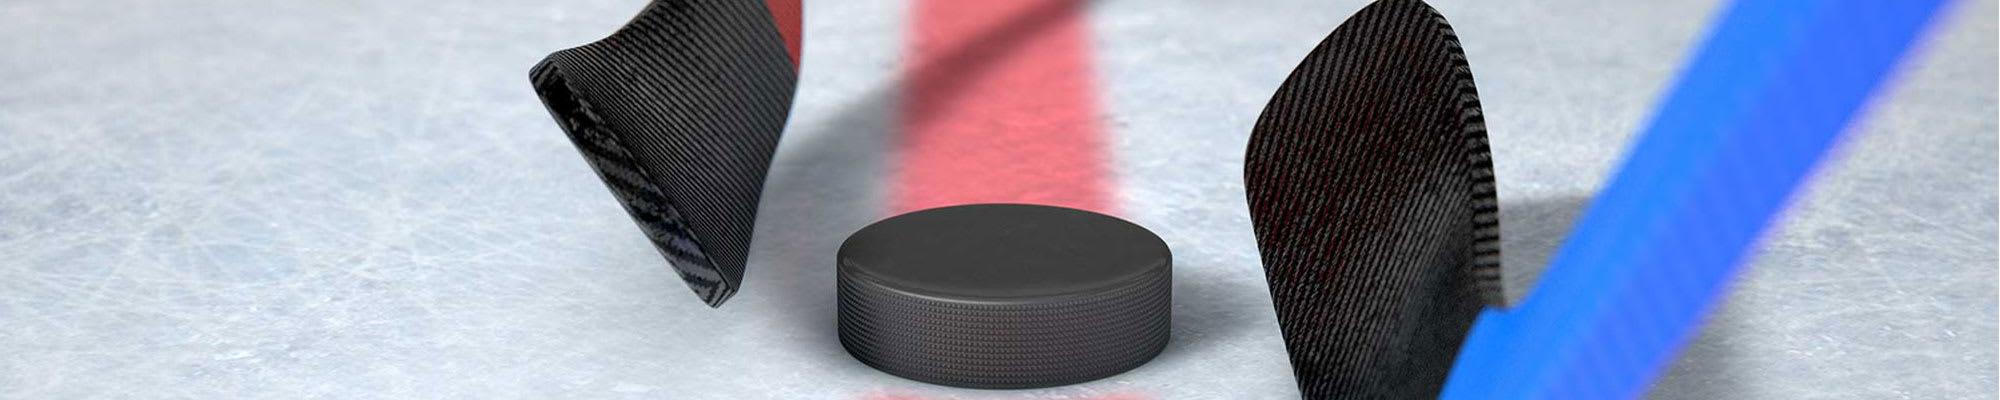 Hockey Stick Blades